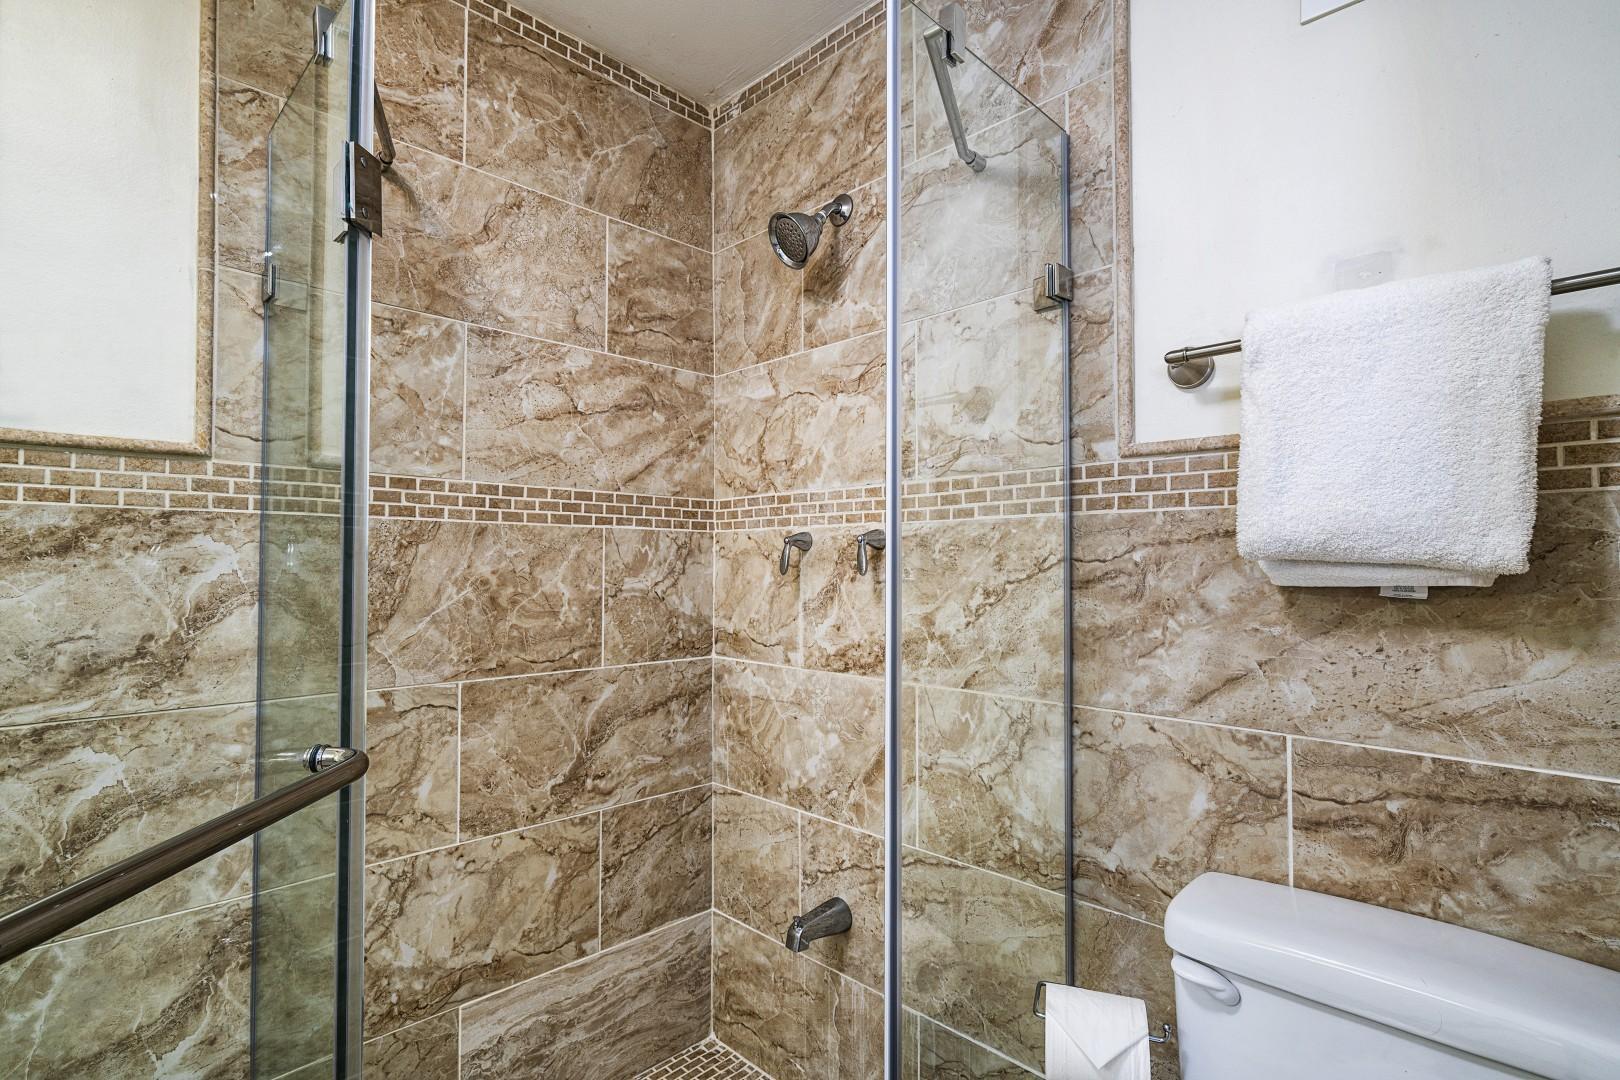 Upstairs walk-in shower.